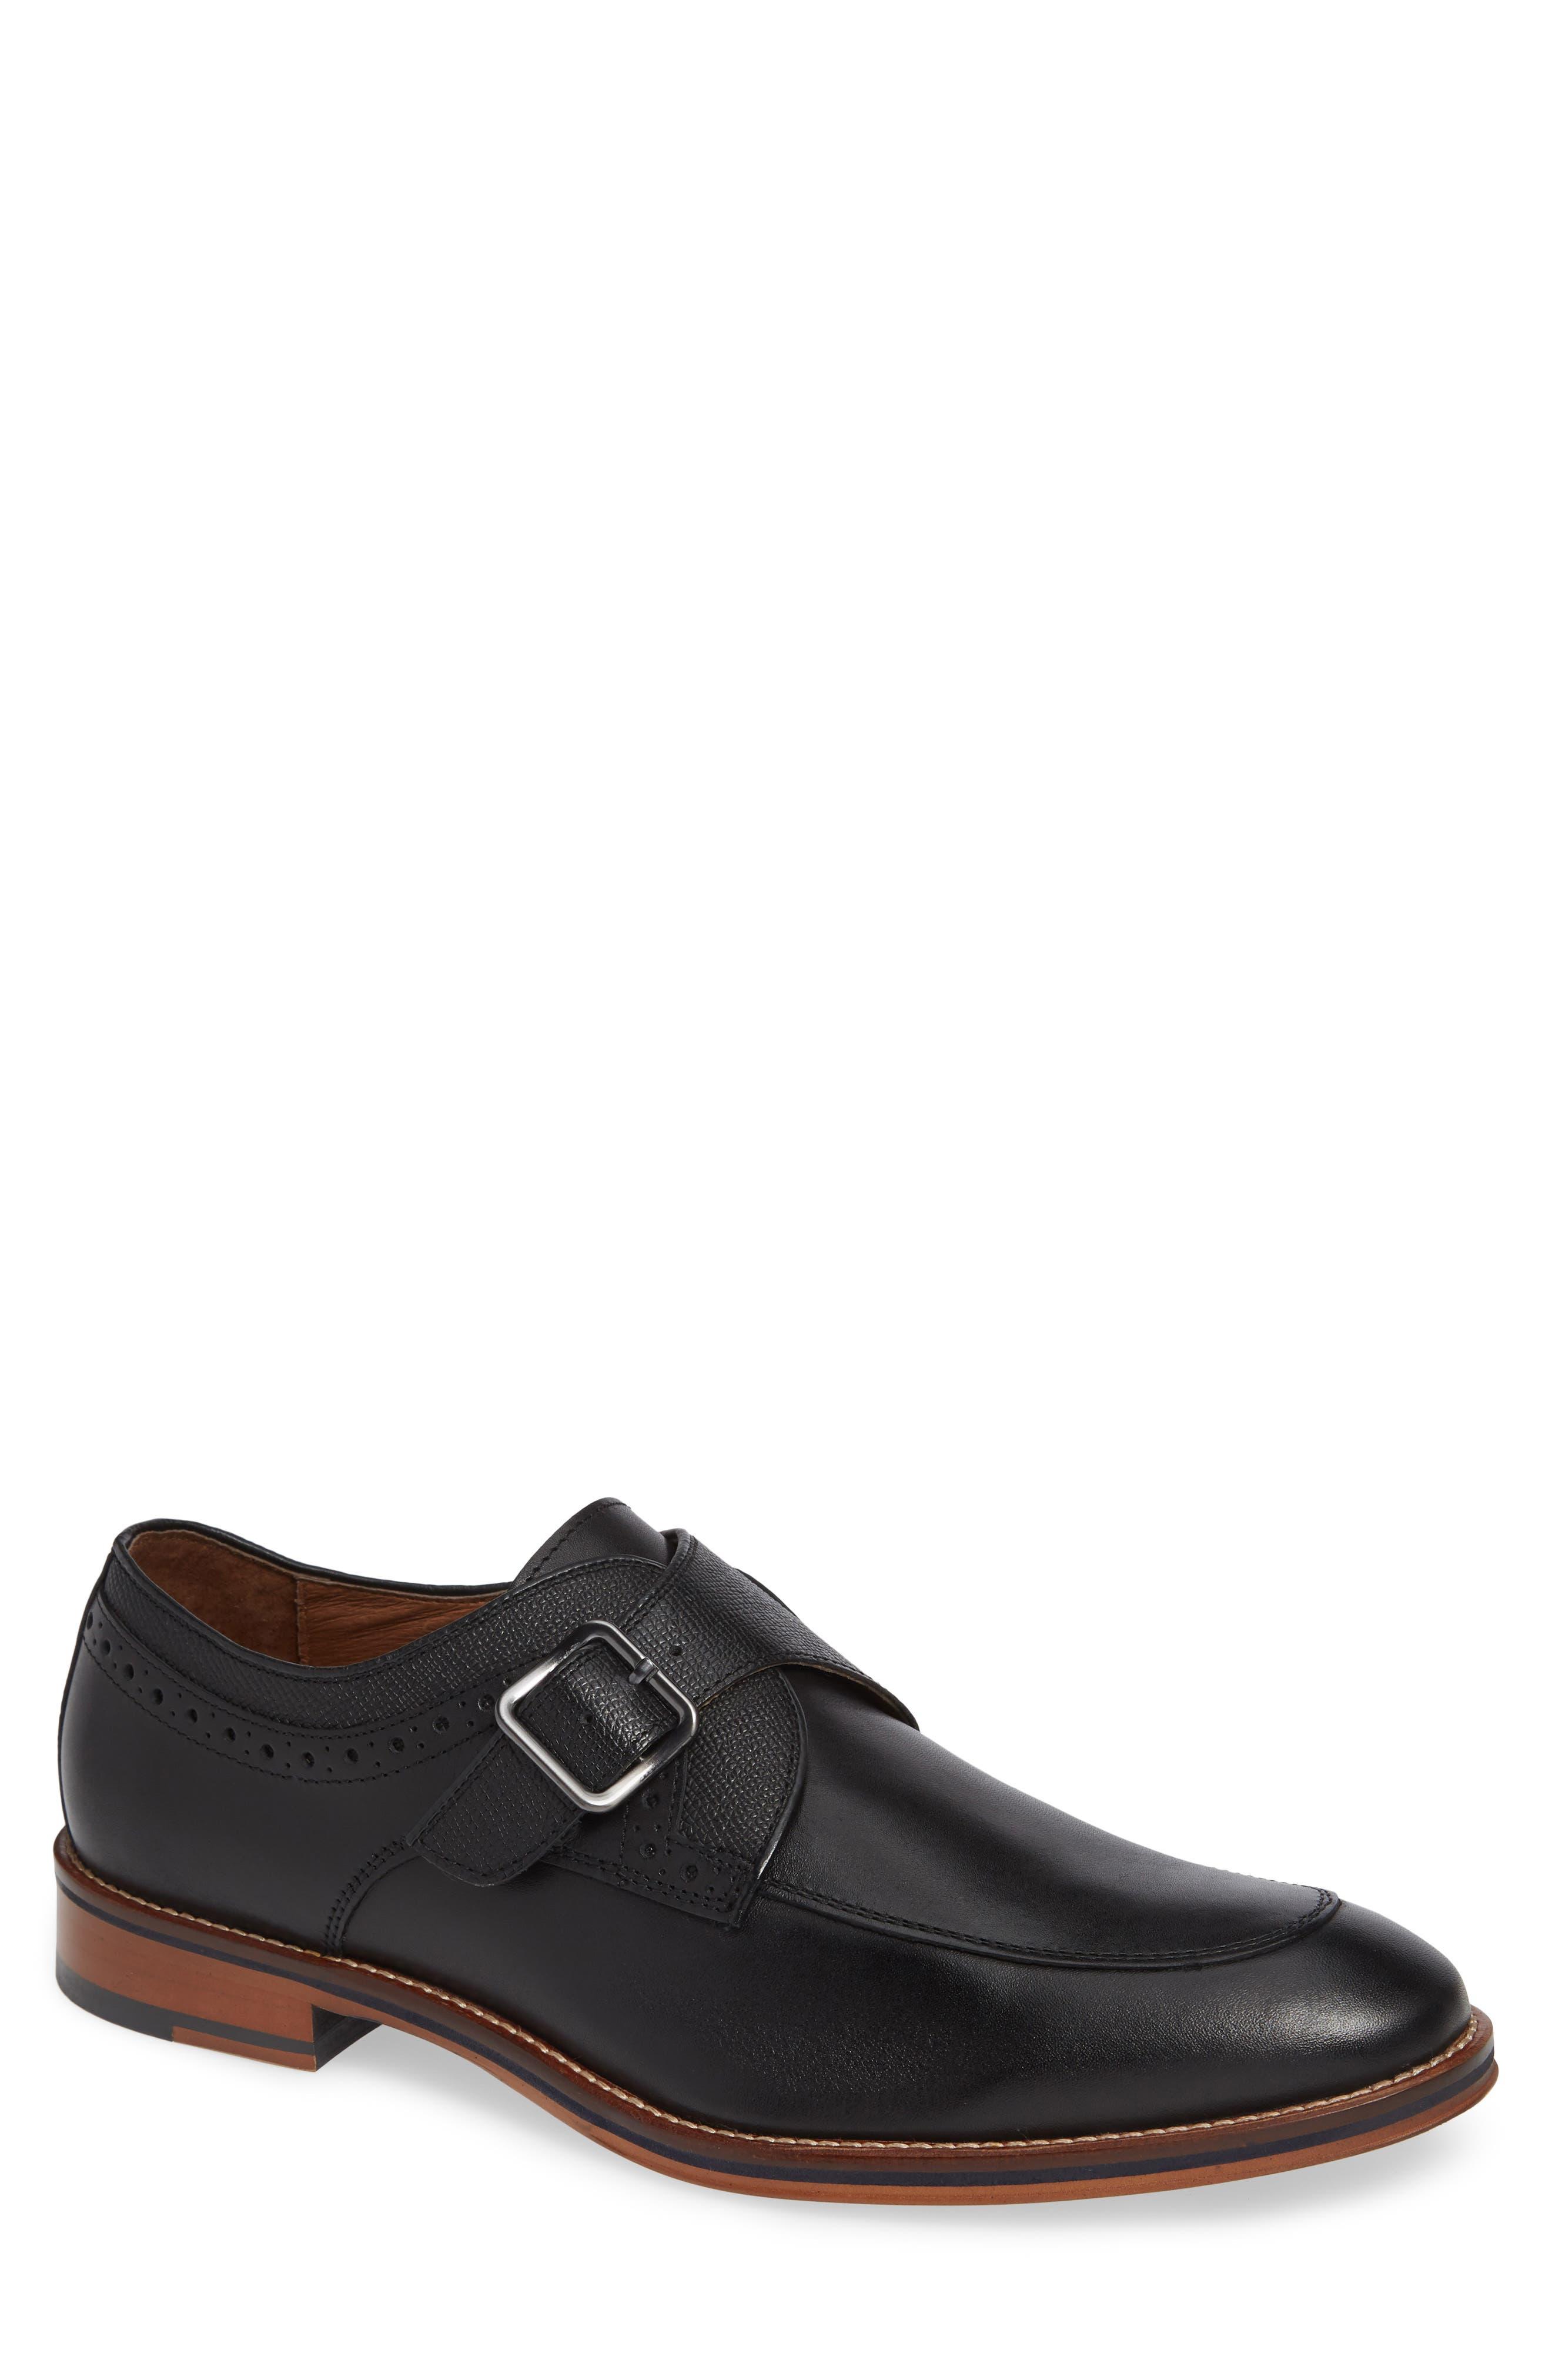 JOHNSTON & MURPHY Conard Monk Strap Shoe, Main, color, BLACK LEATHER